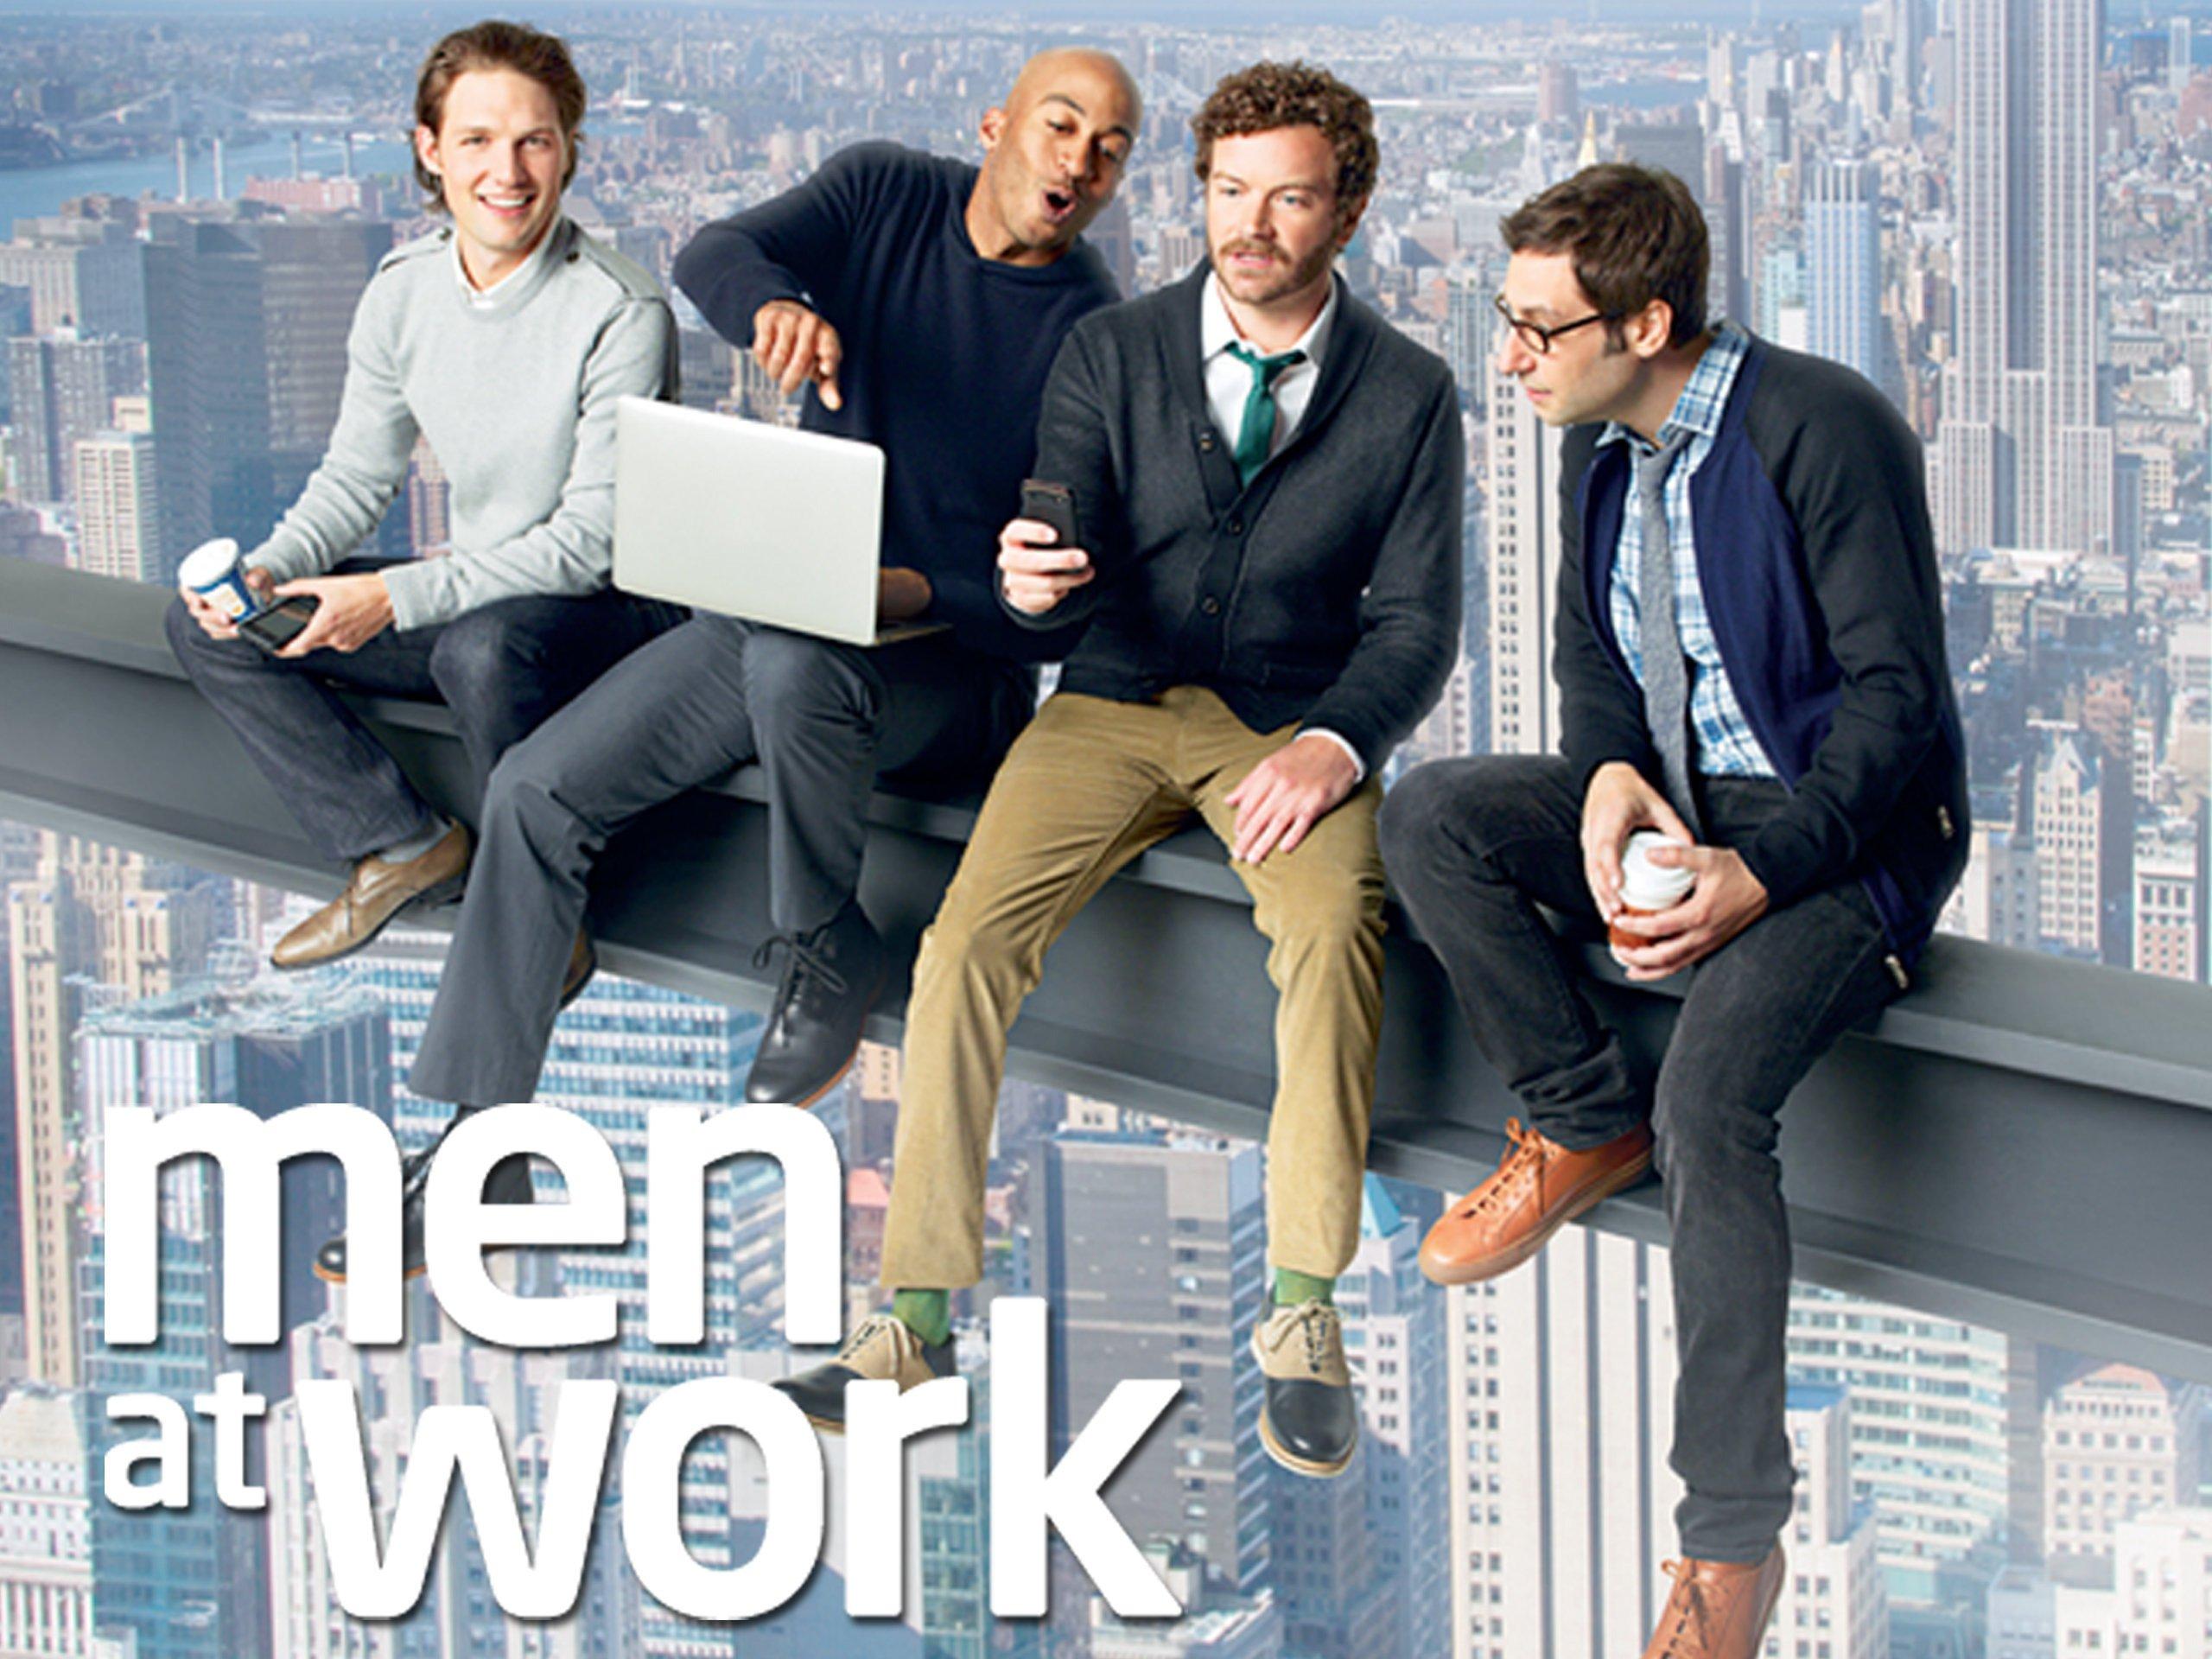 Amazonde Men At Work Season 1 Ov Ansehen Prime Video